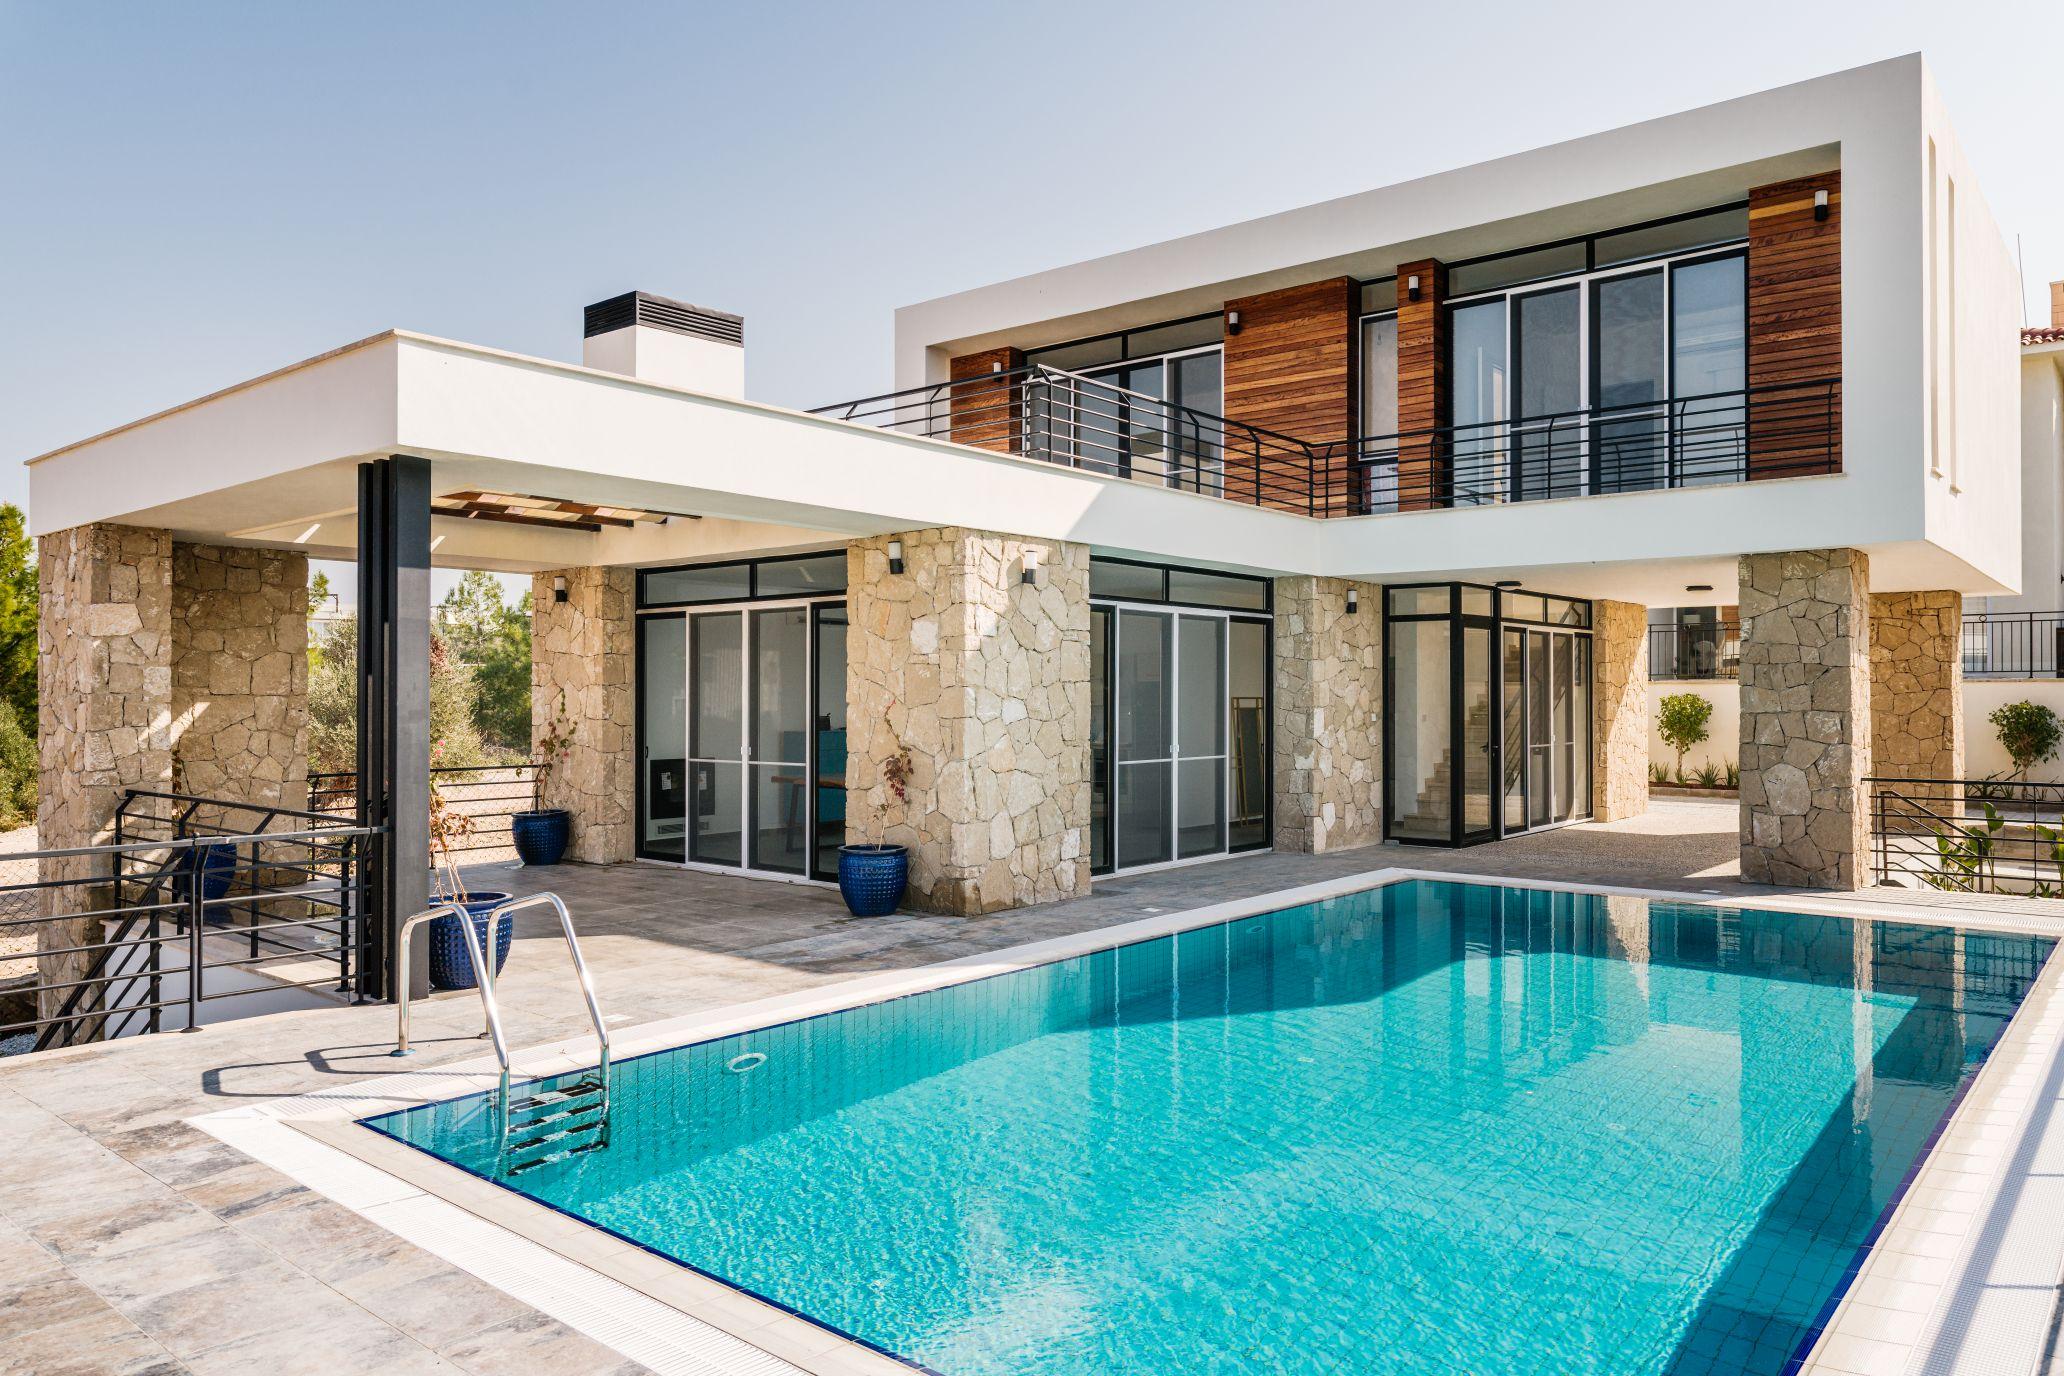 villa properties by kensington